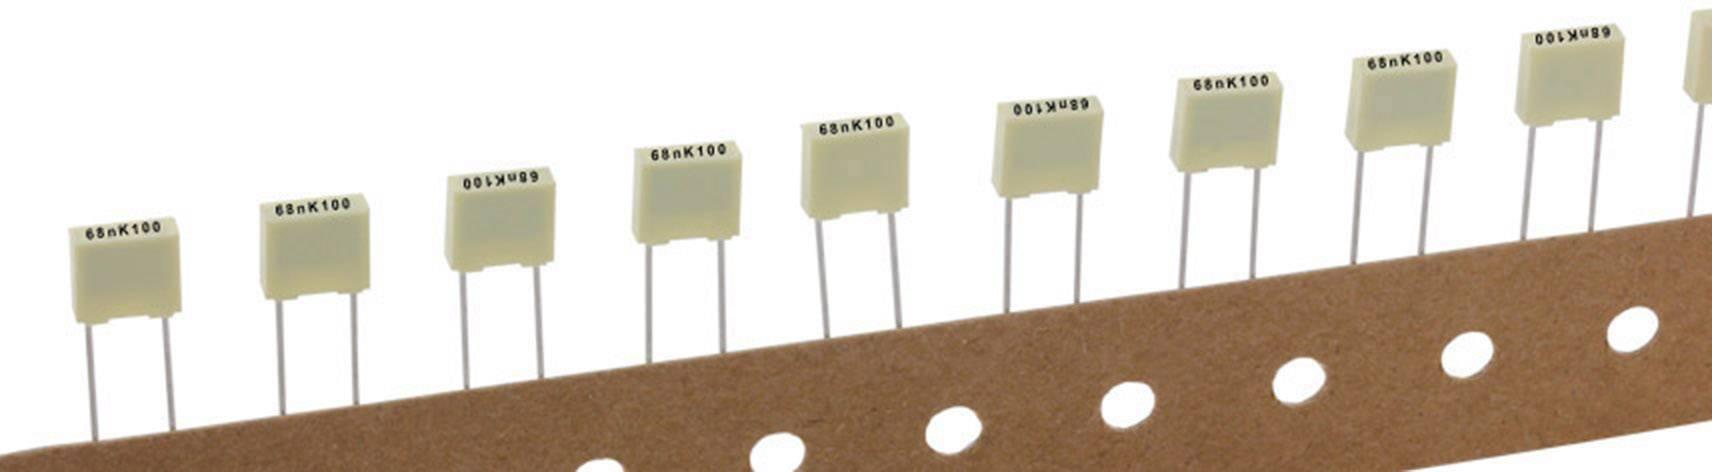 Polyesterový kondenzátor Kemet R82EC2680DQ60K+ radiálne vývody, 68 nF, 100 V,10 %, 5 mm, (d x š x v) 7.2 x 2.5 mm x 6.5 mm, 1 ks